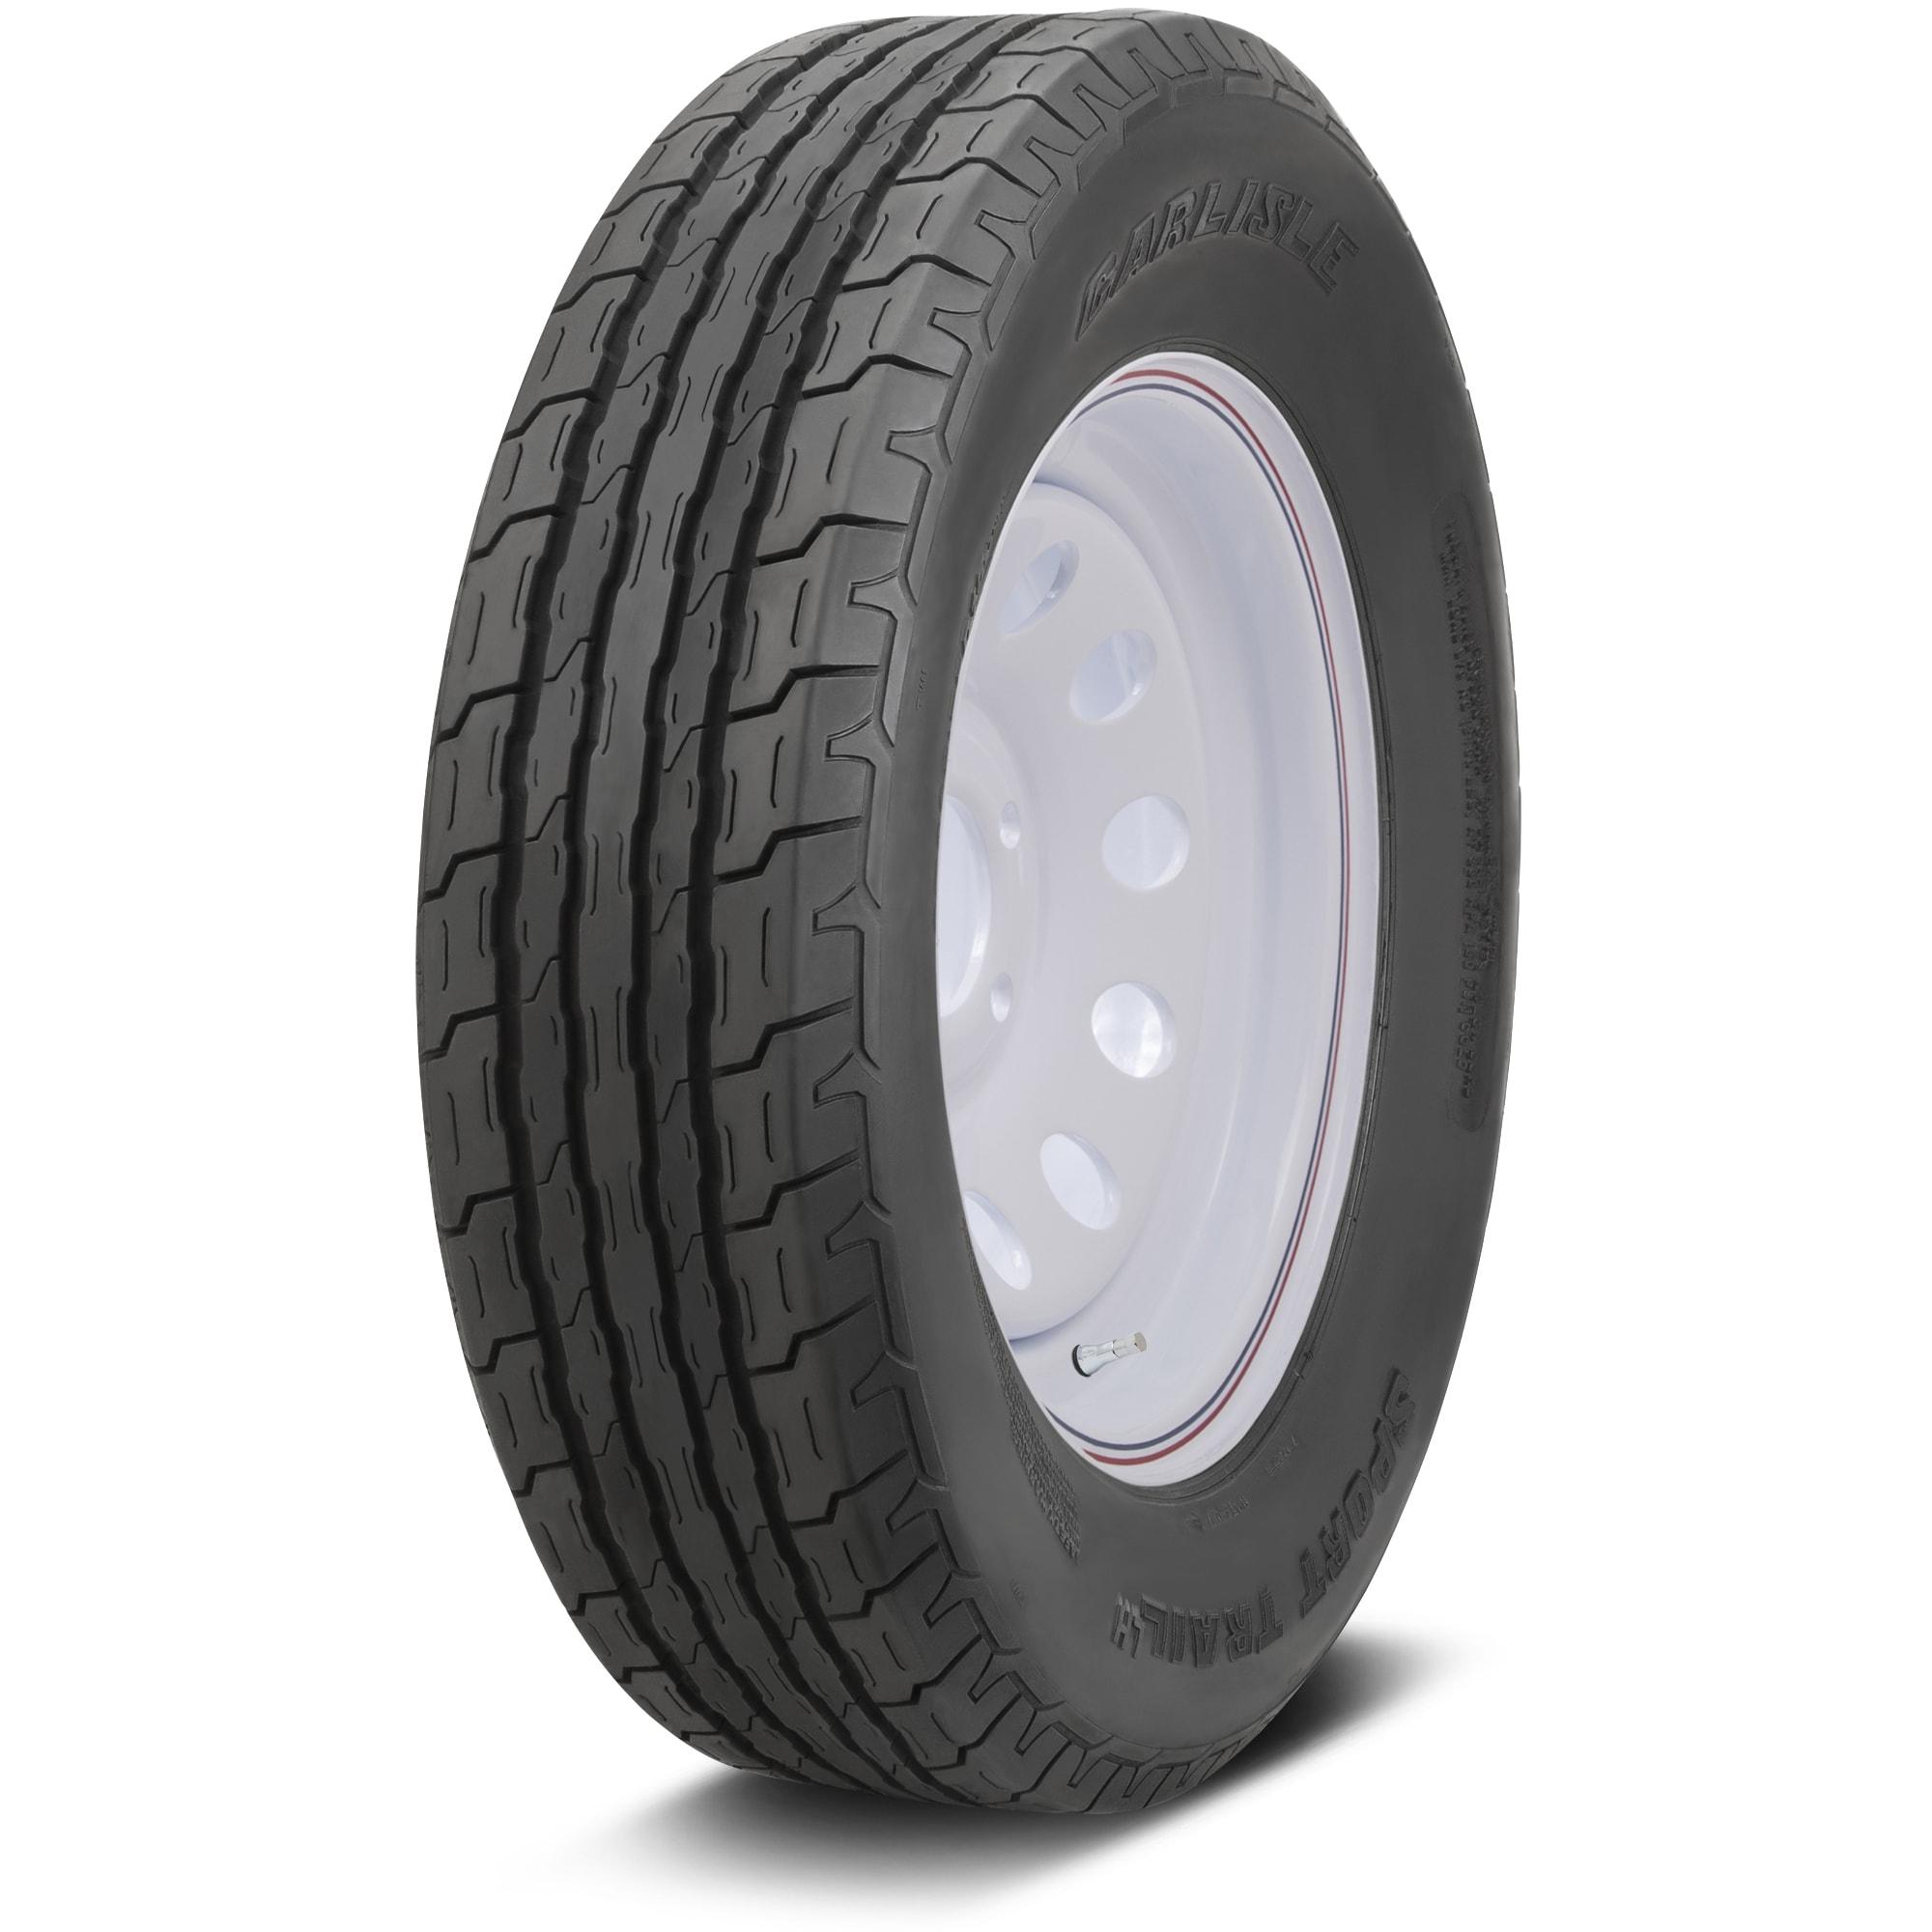 Carlisle Sport Trail LH Bias Trailer Tire - 480-12 LRB/4 ...